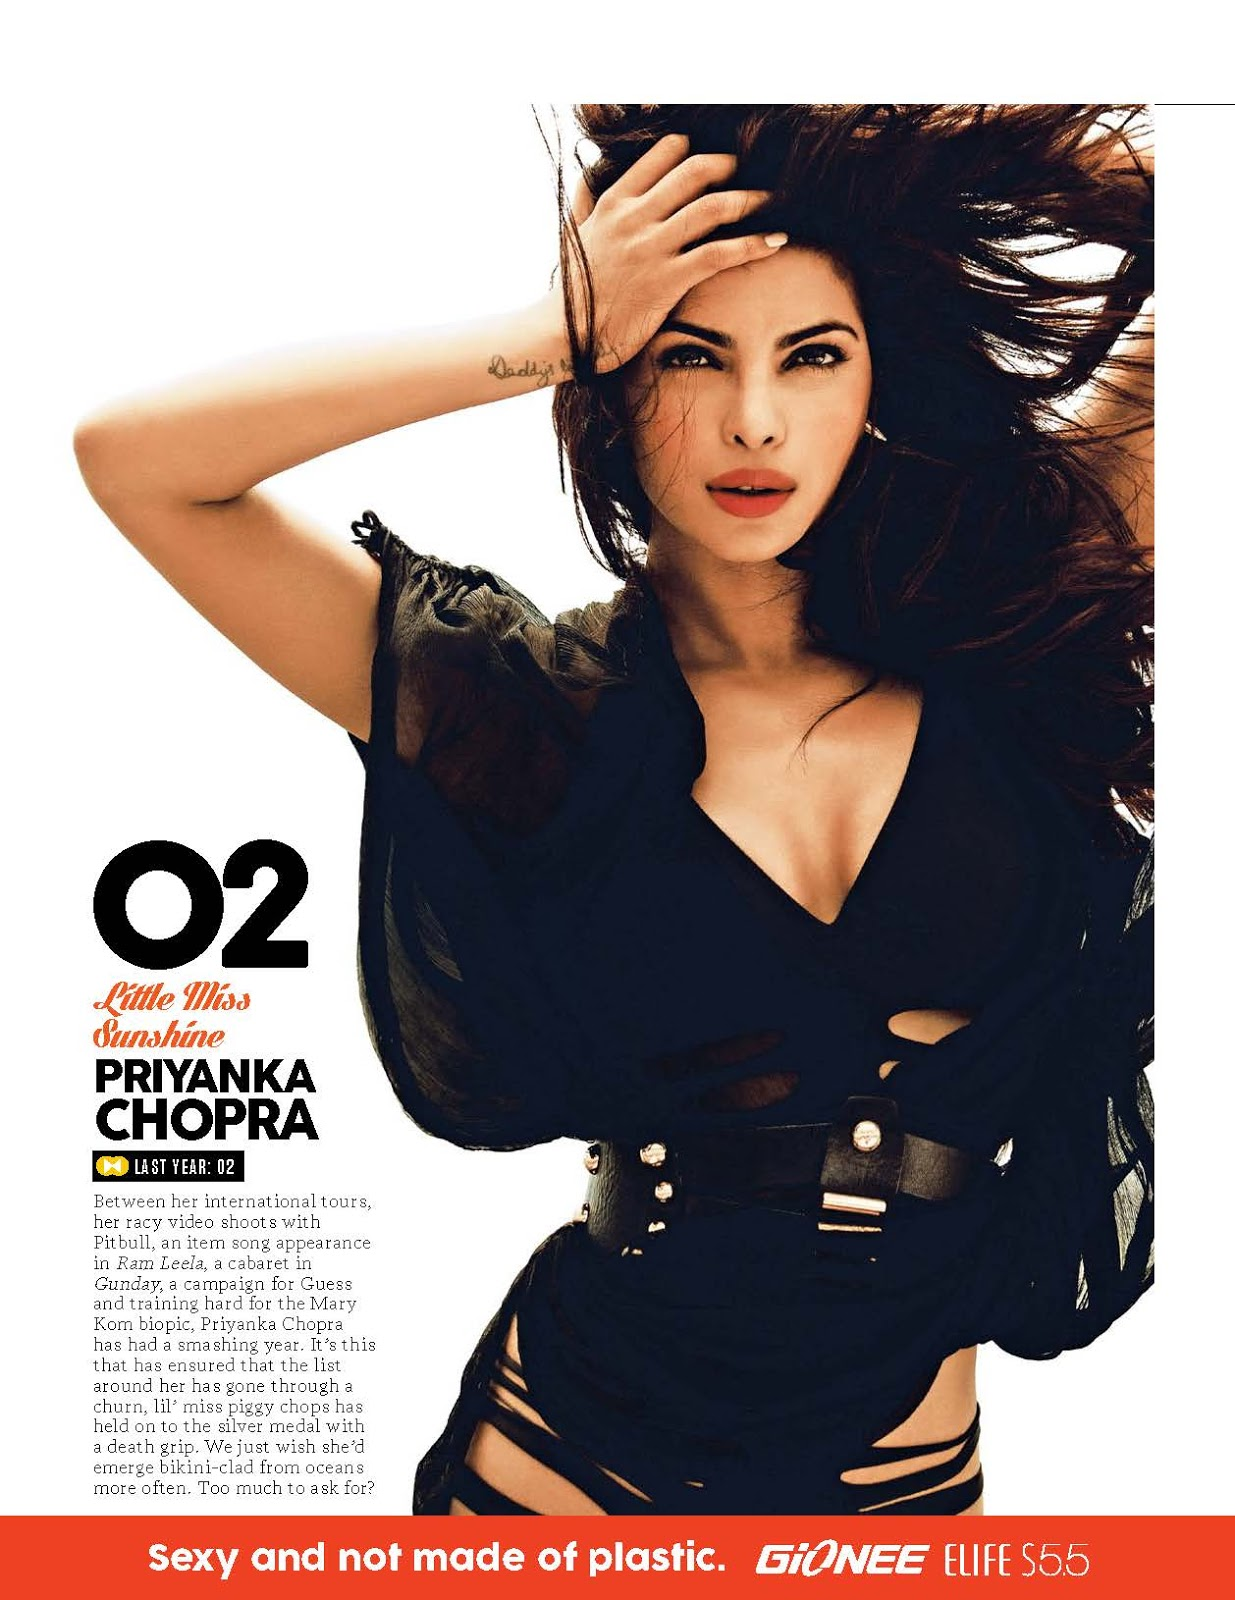 Glamourous Priyanka Chopra FHM magazine